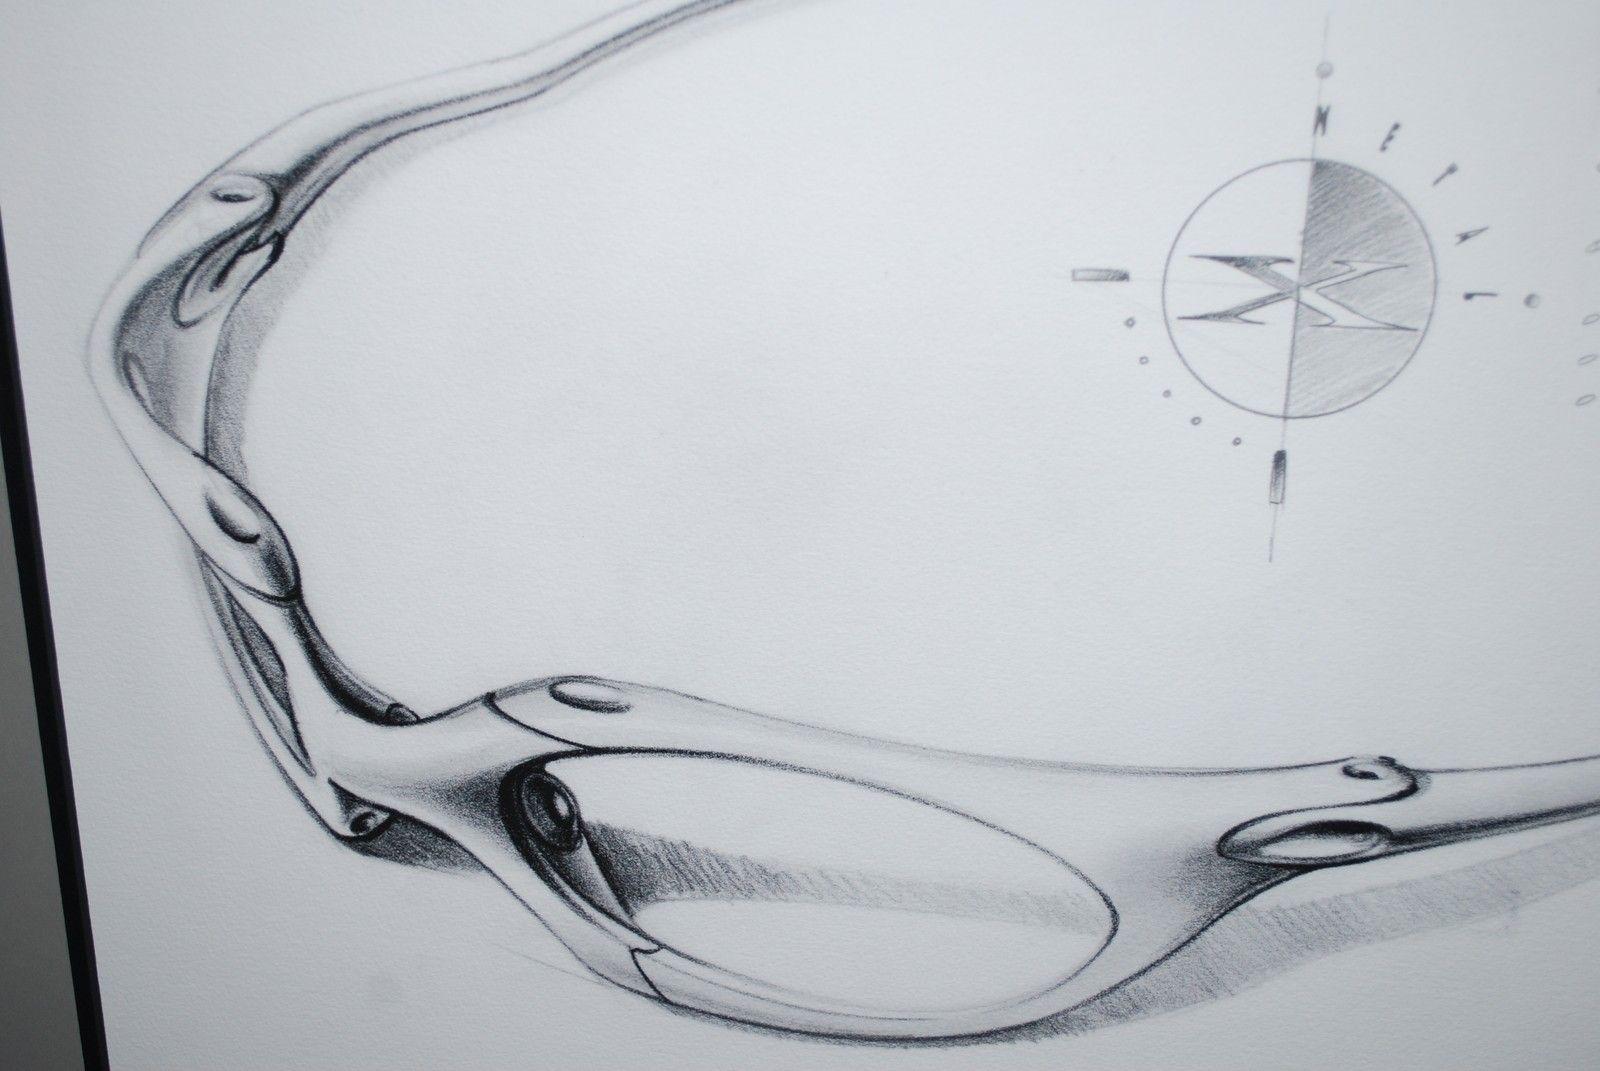 Oakley Giclee Romeo sketch/lithograph - DSC_0295.JPG